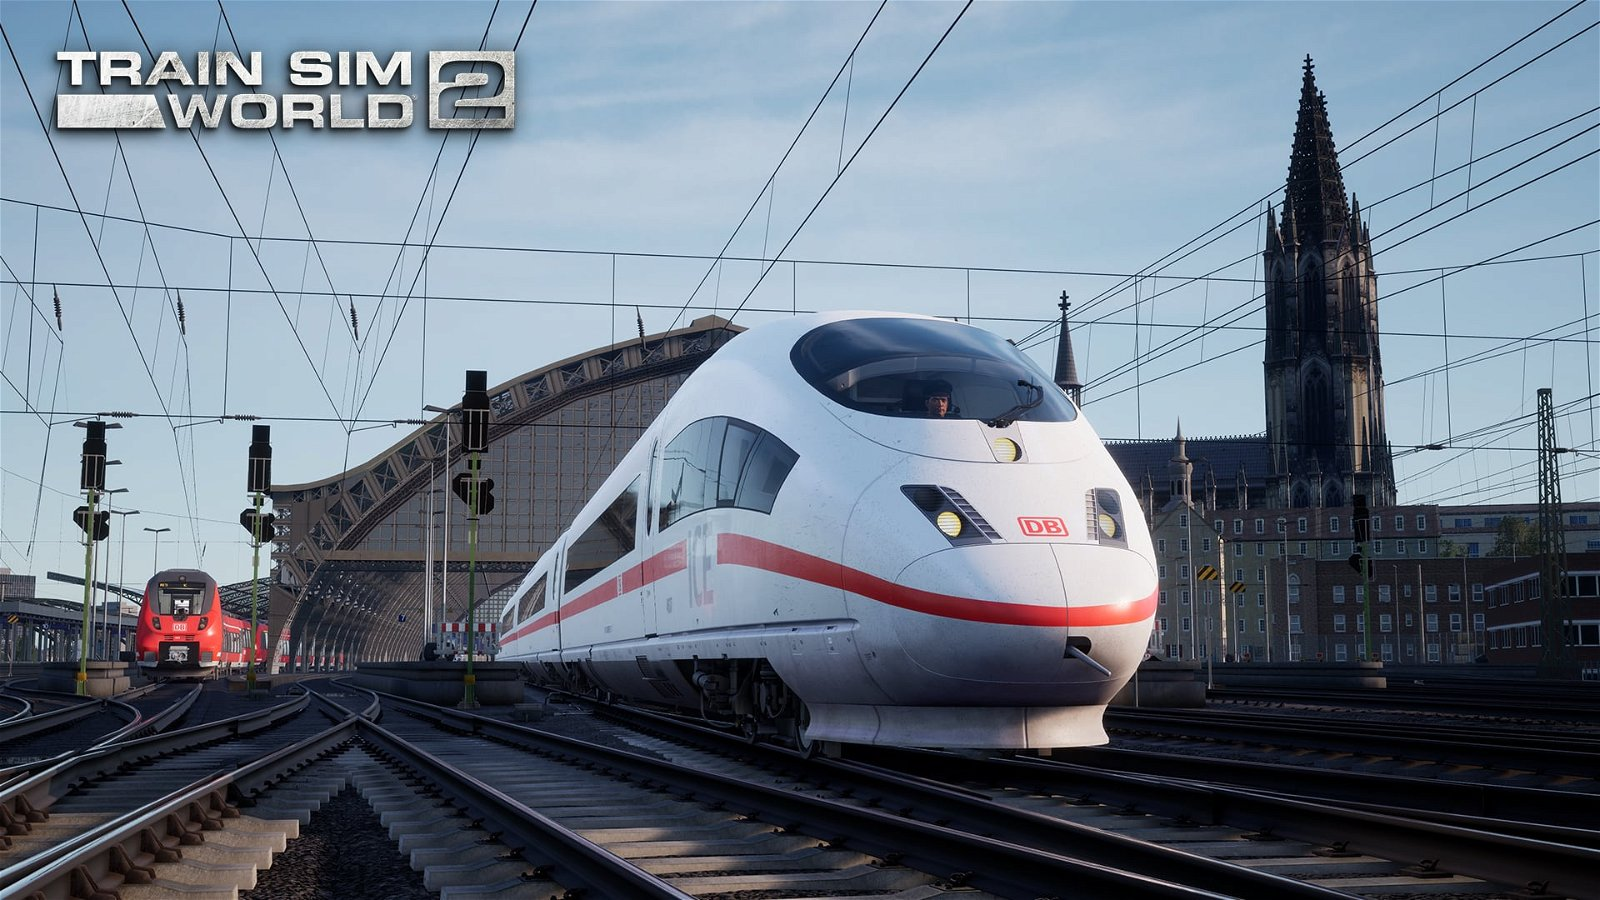 Train Sim World 2 Update 1.012